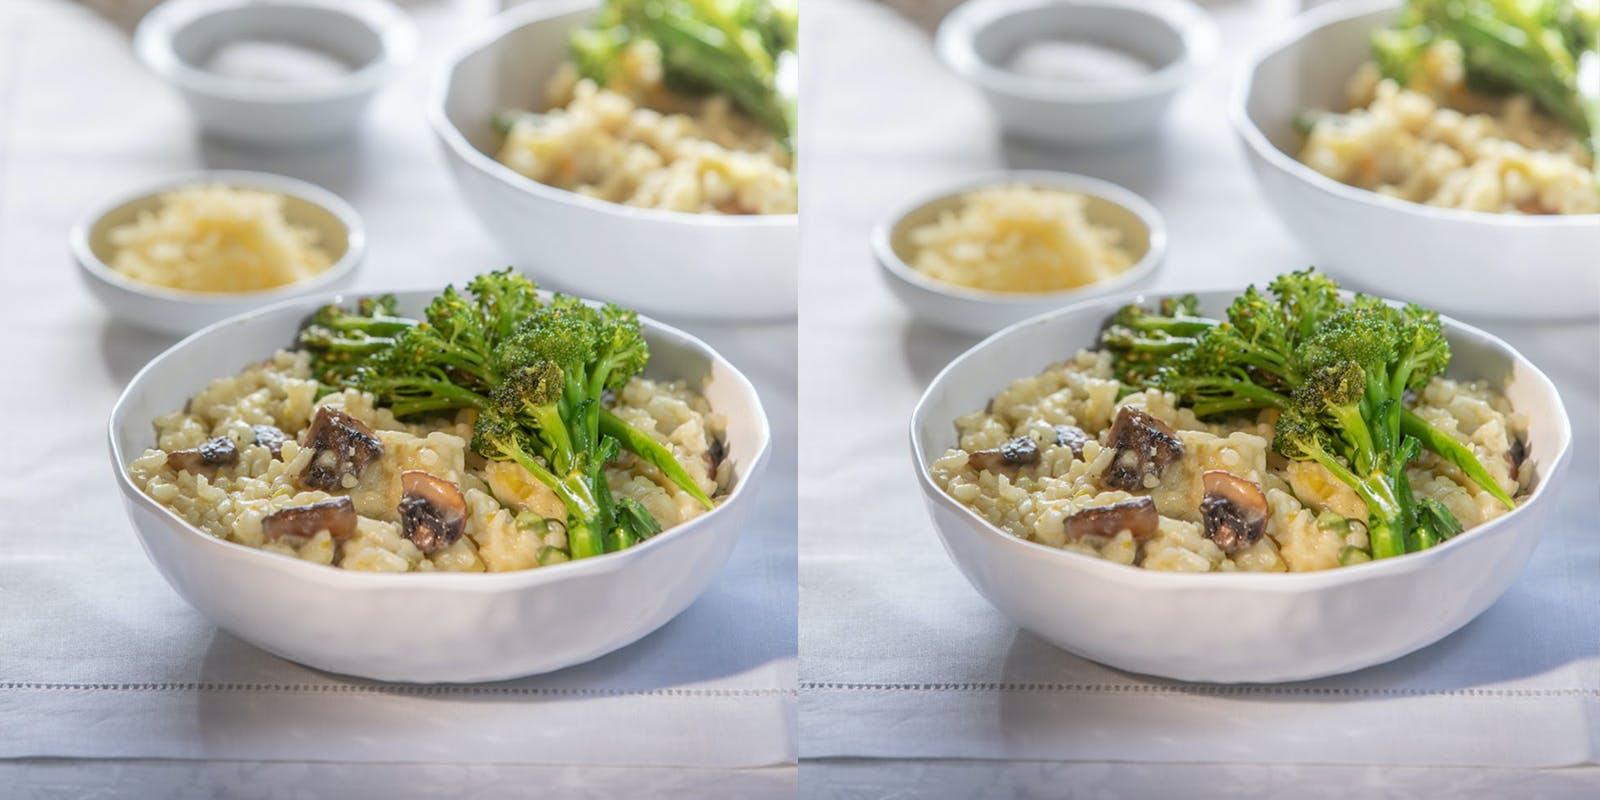 Ganesh's Leek, Mushroom & Asparagus Risotto with Broccolini